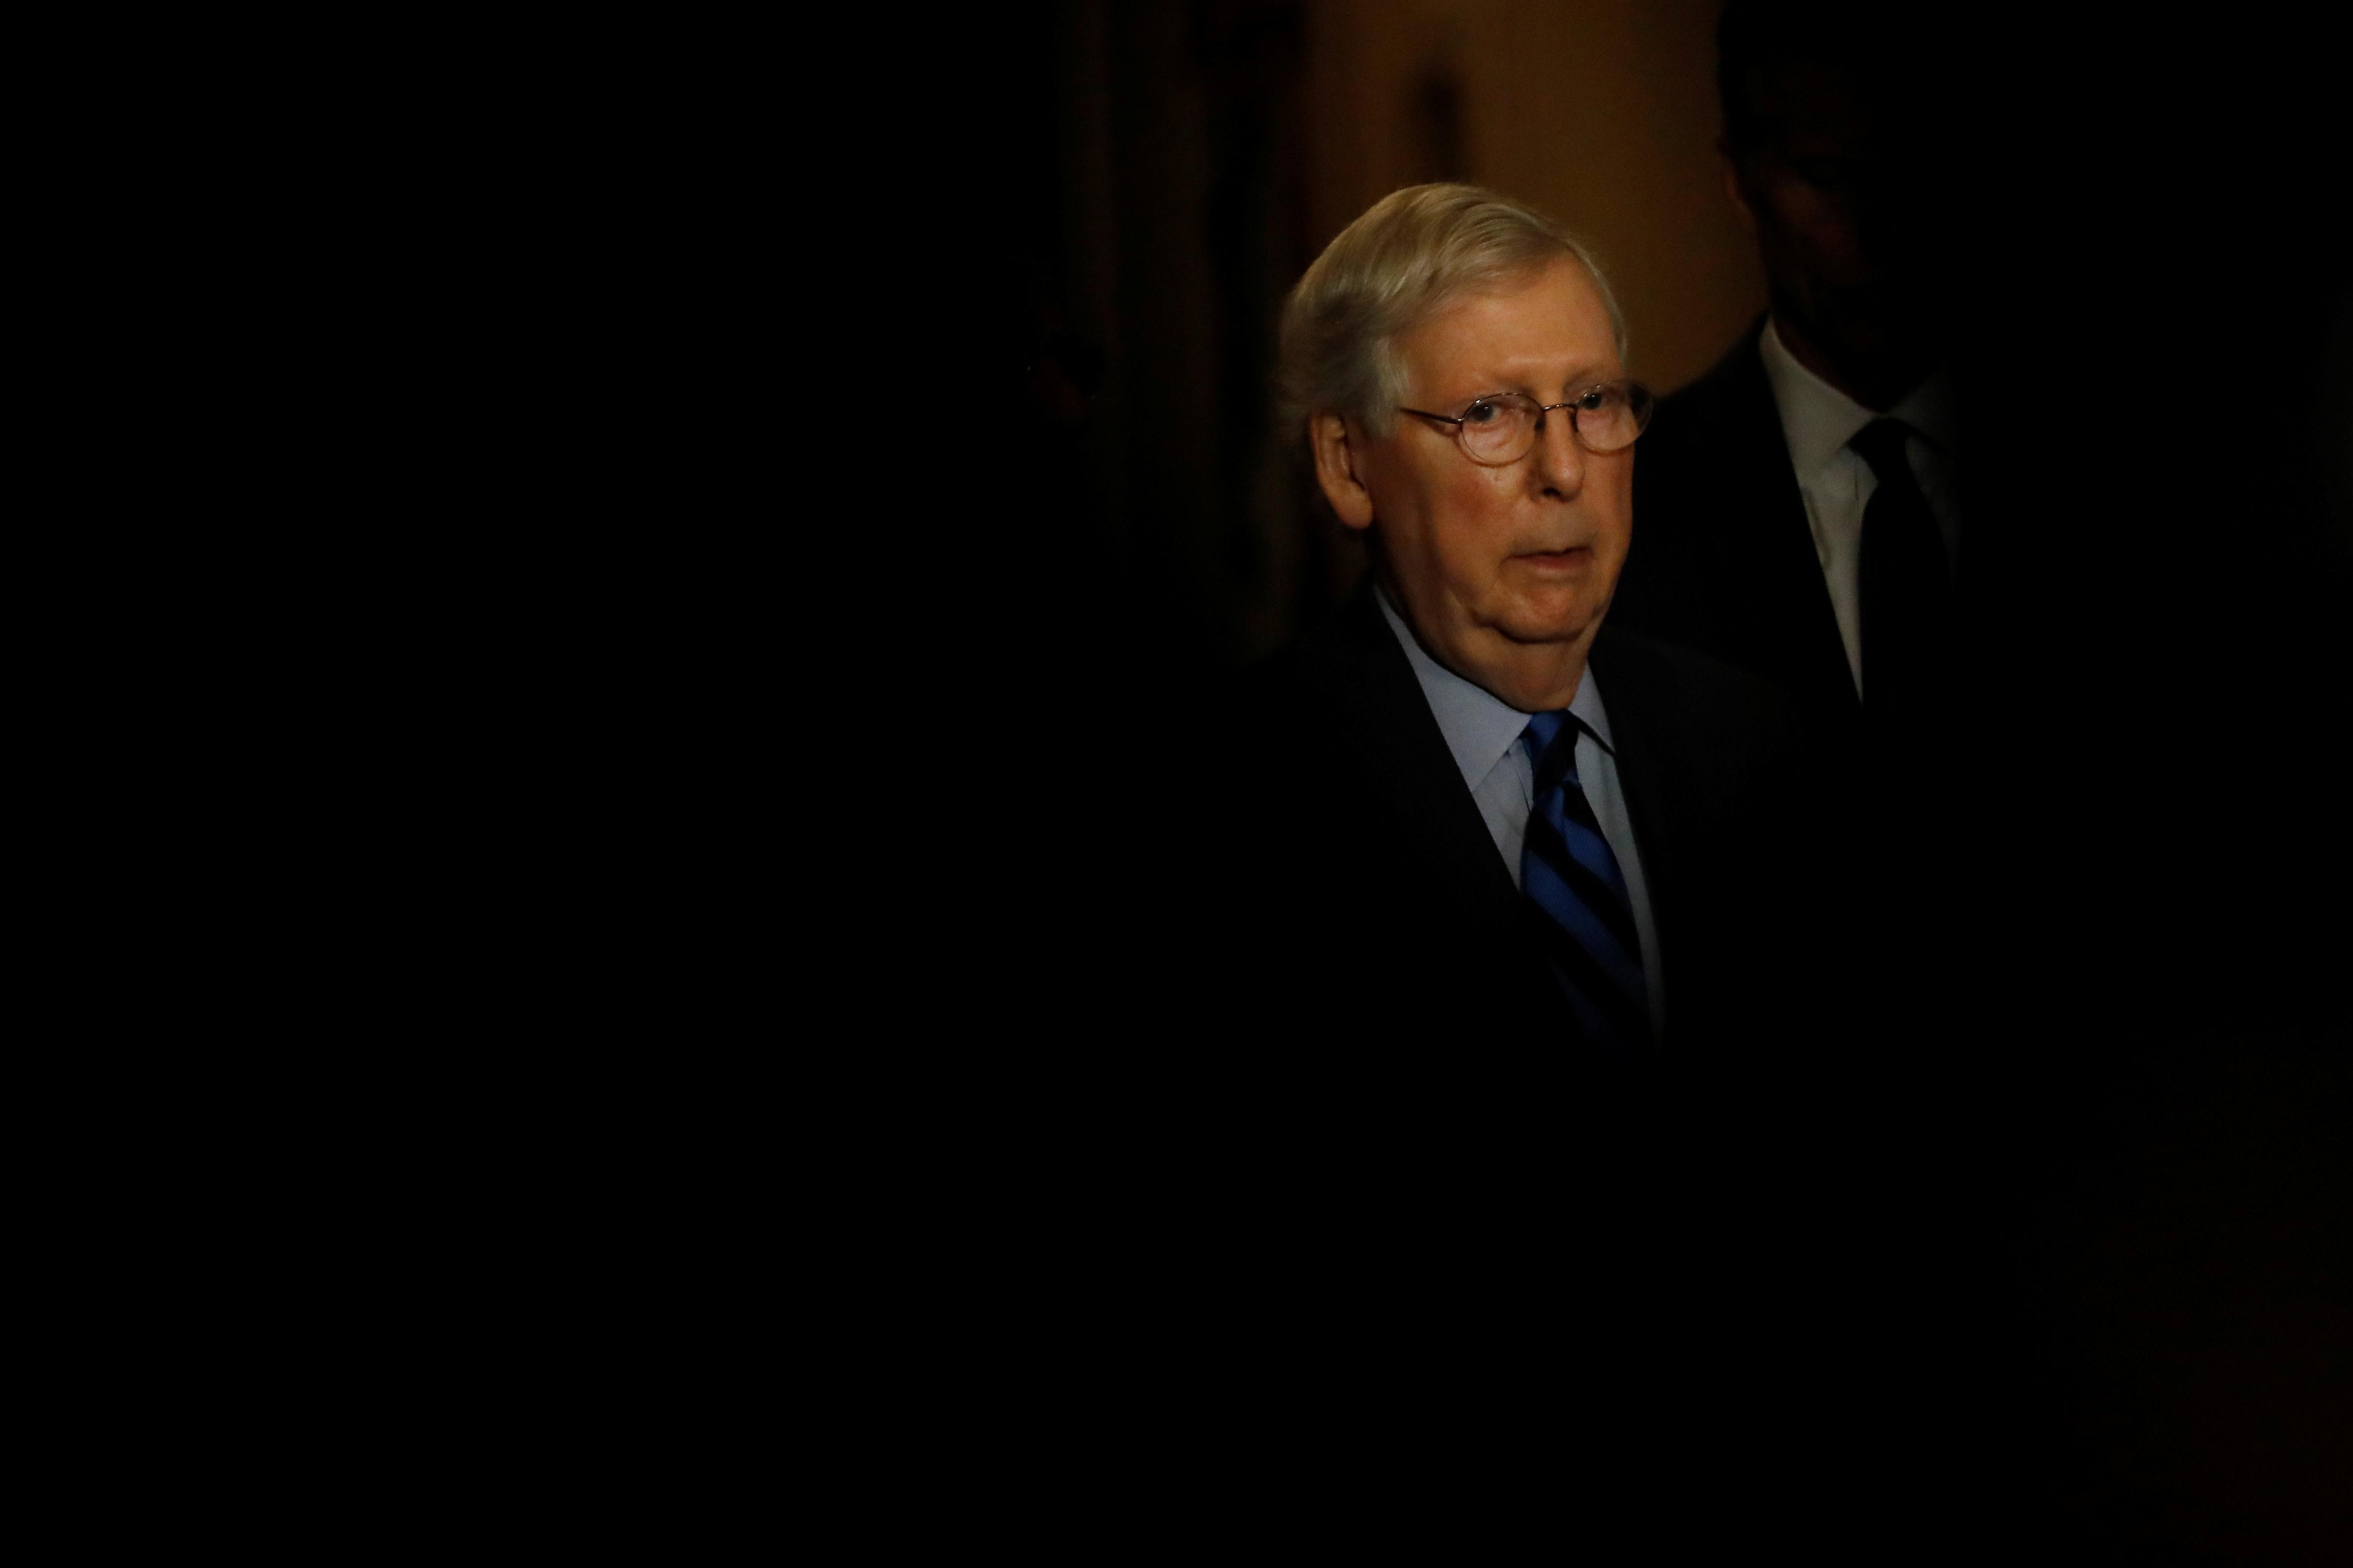 Top U.S. Senate Republican seeks stronger resolution on Syria